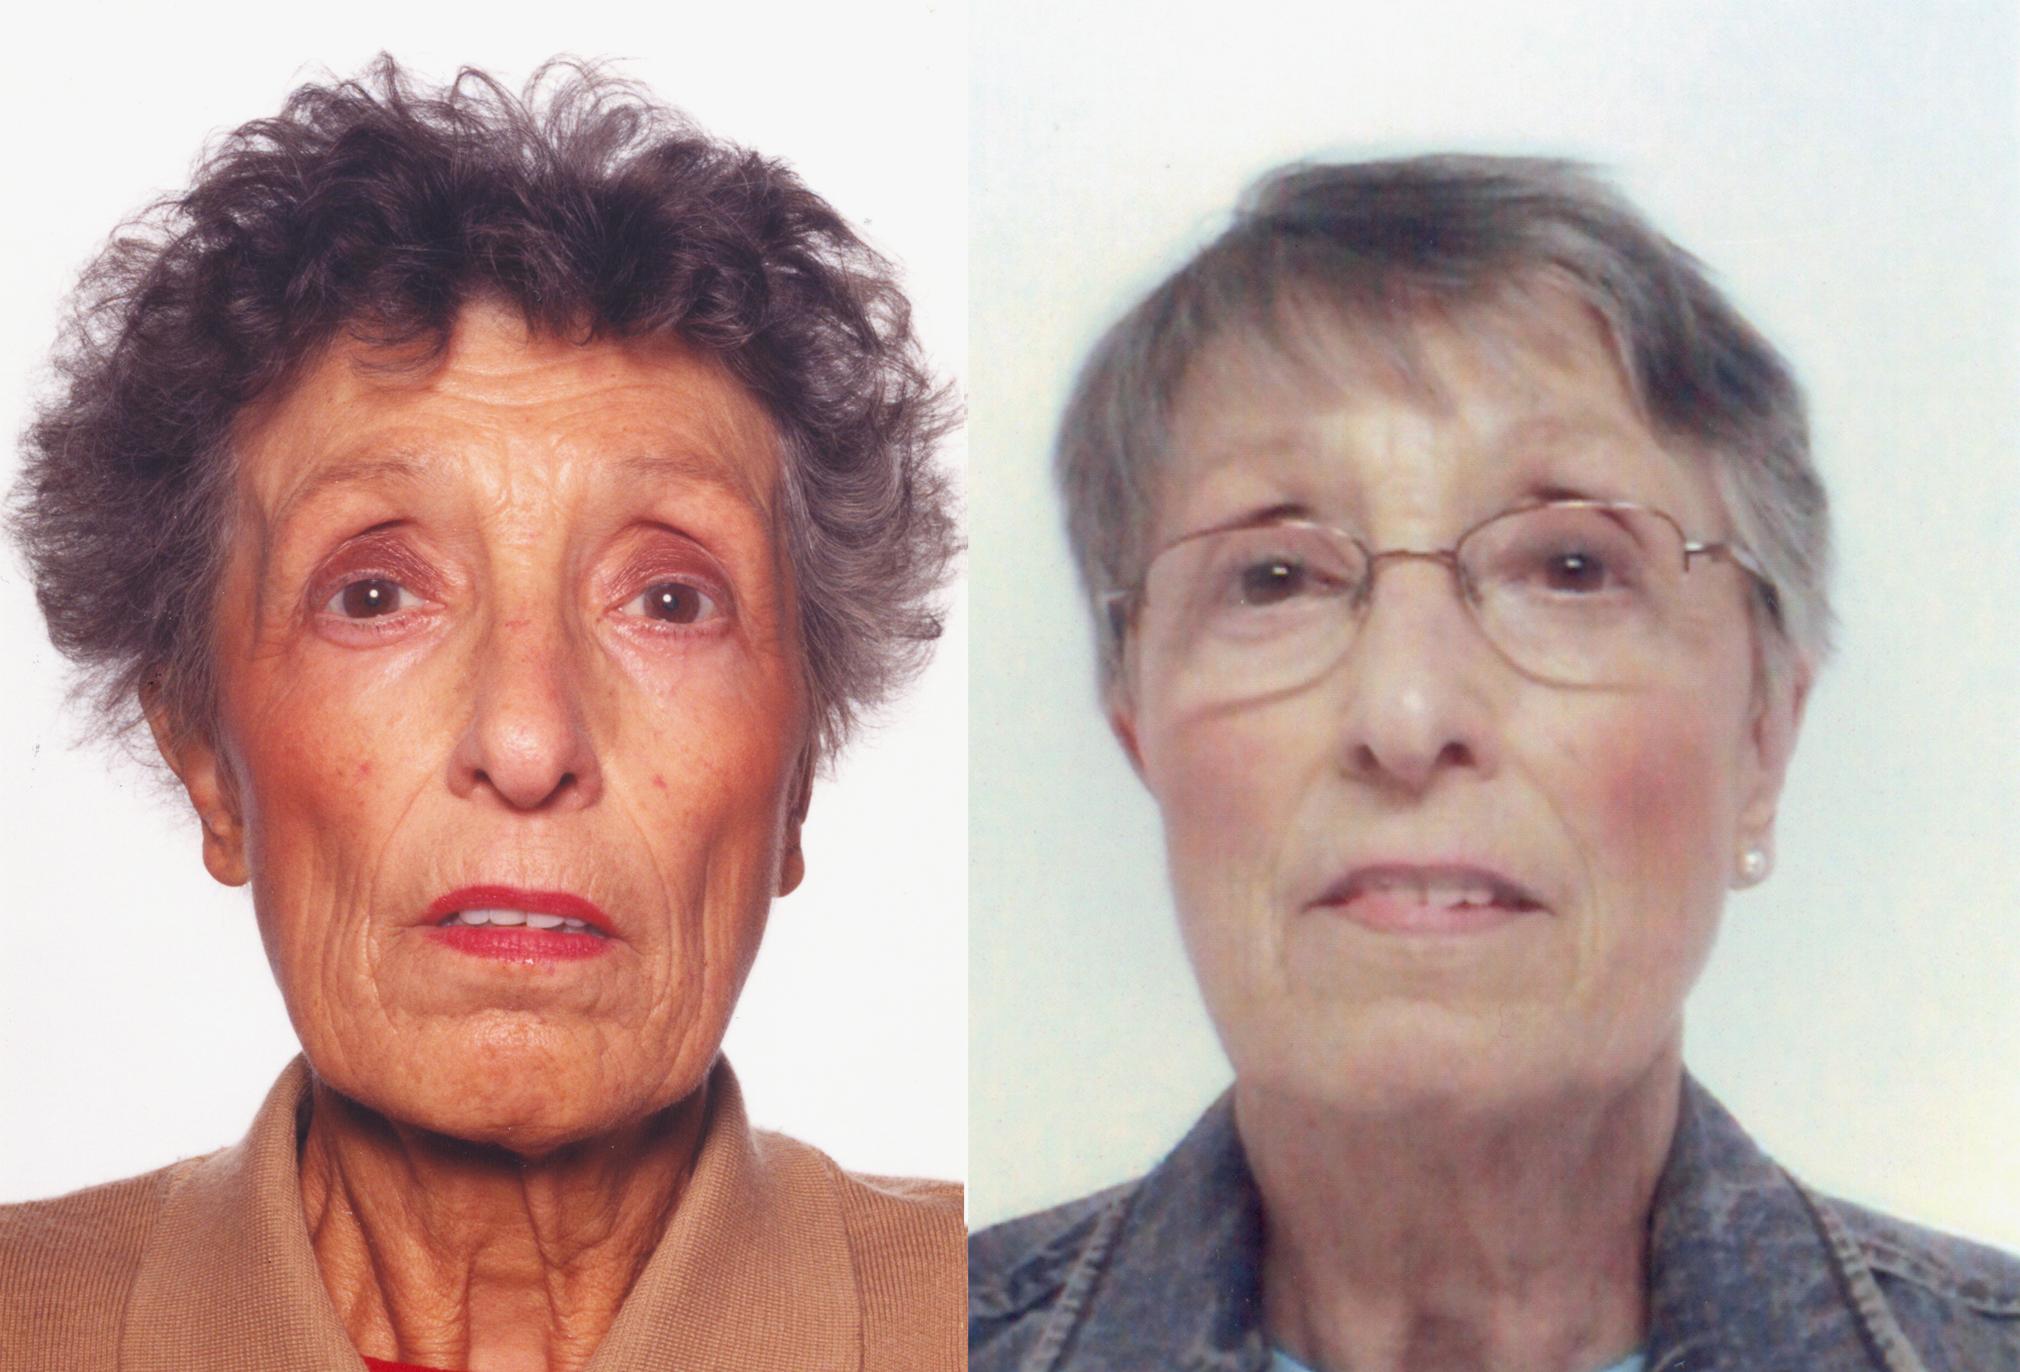 Addison's Disease: Hyperpigmentation